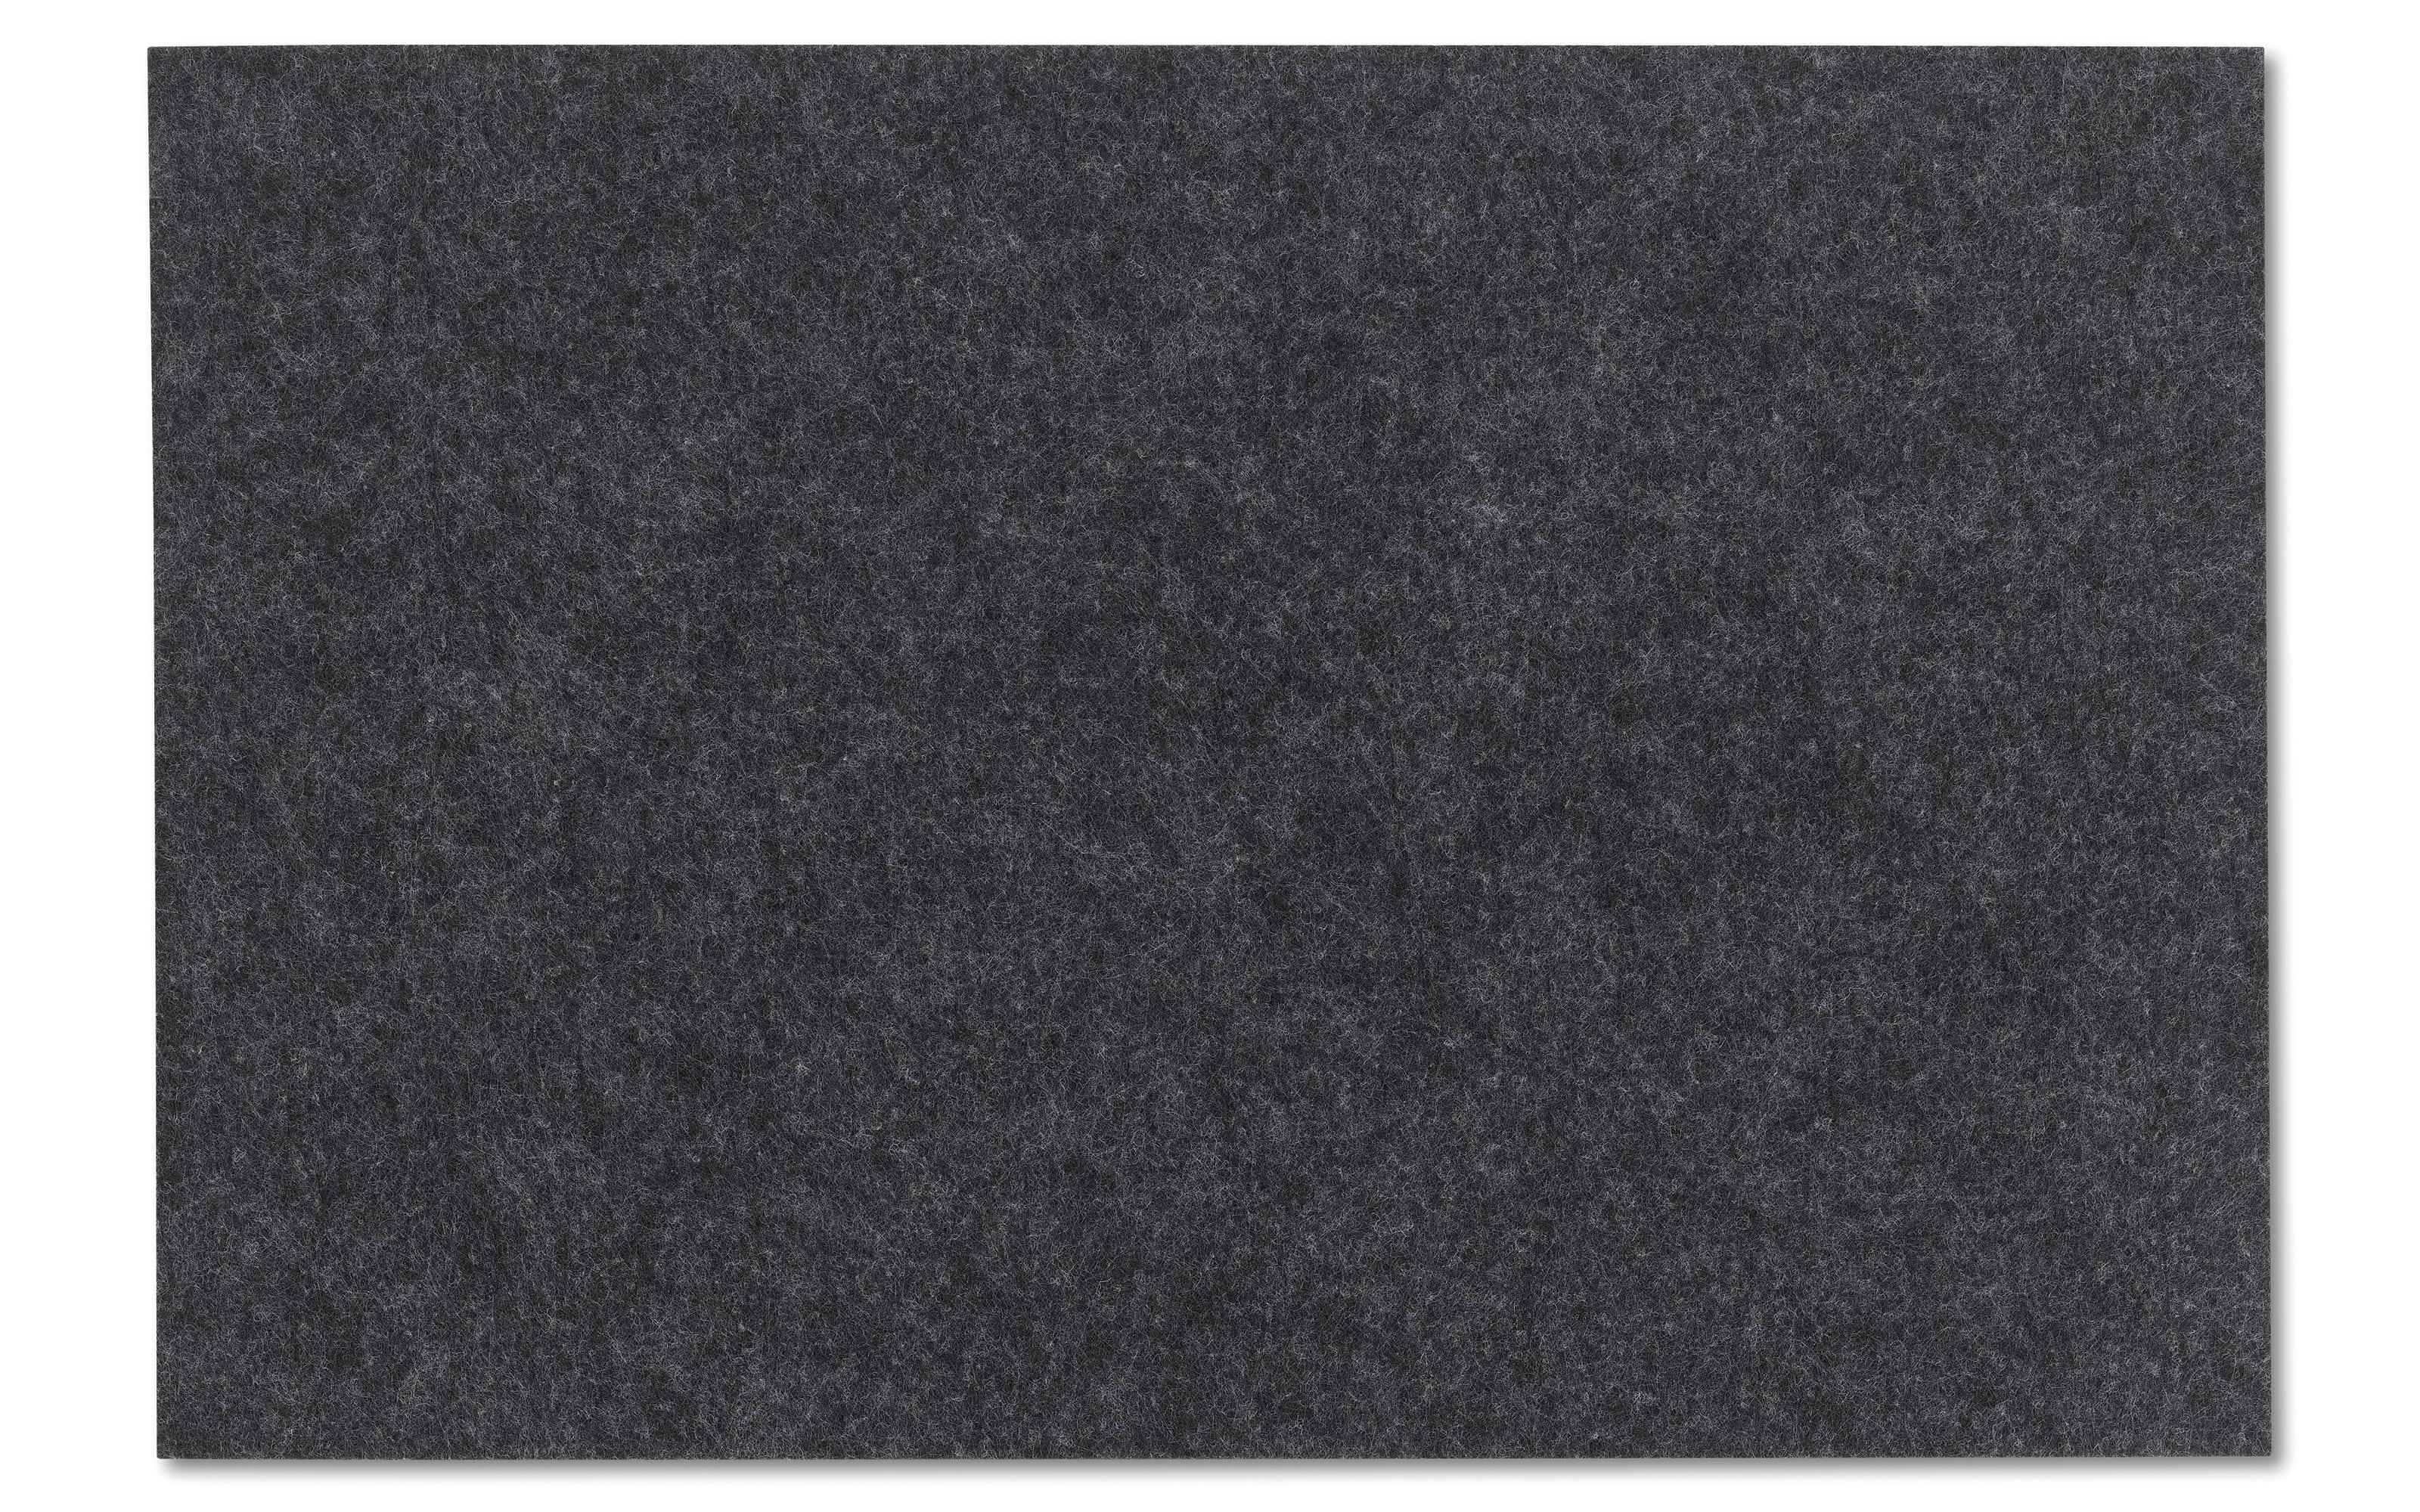 Tischset Alia in dunkelgrau, 30 x 45 cm